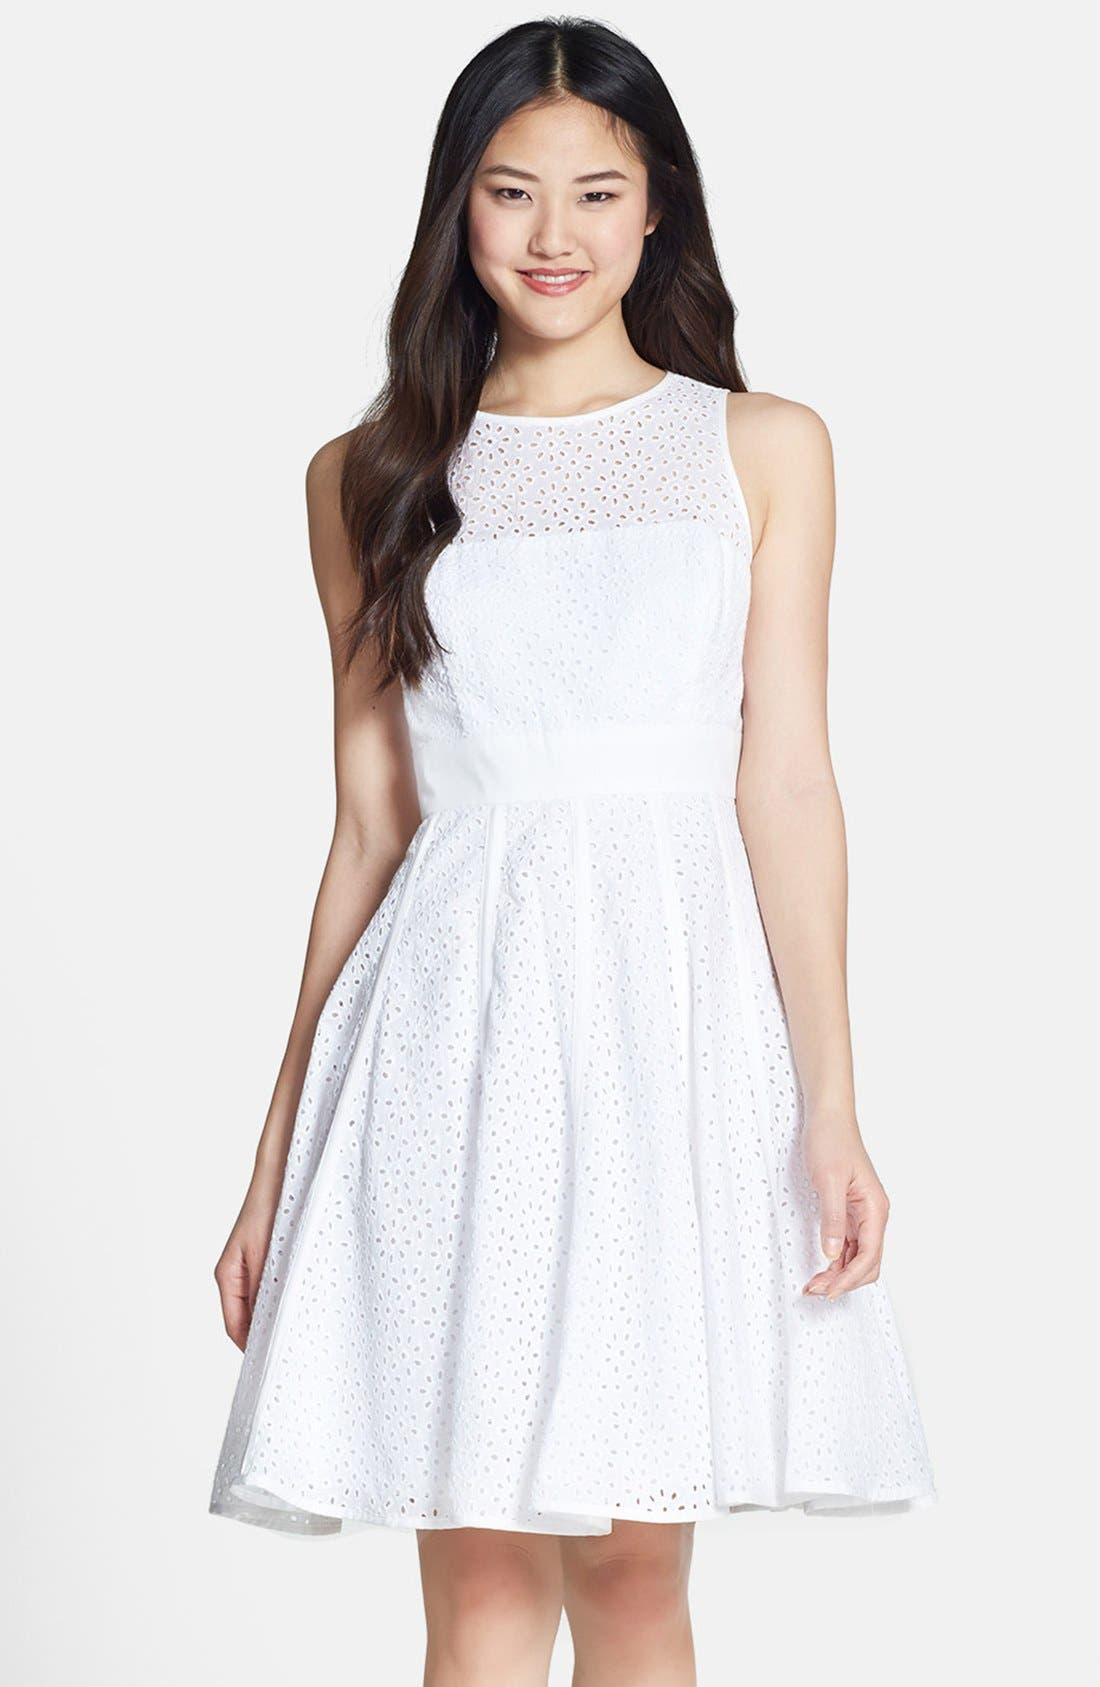 Alternate Image 1 Selected - Eliza J Eyelet Fit & Flare Dress